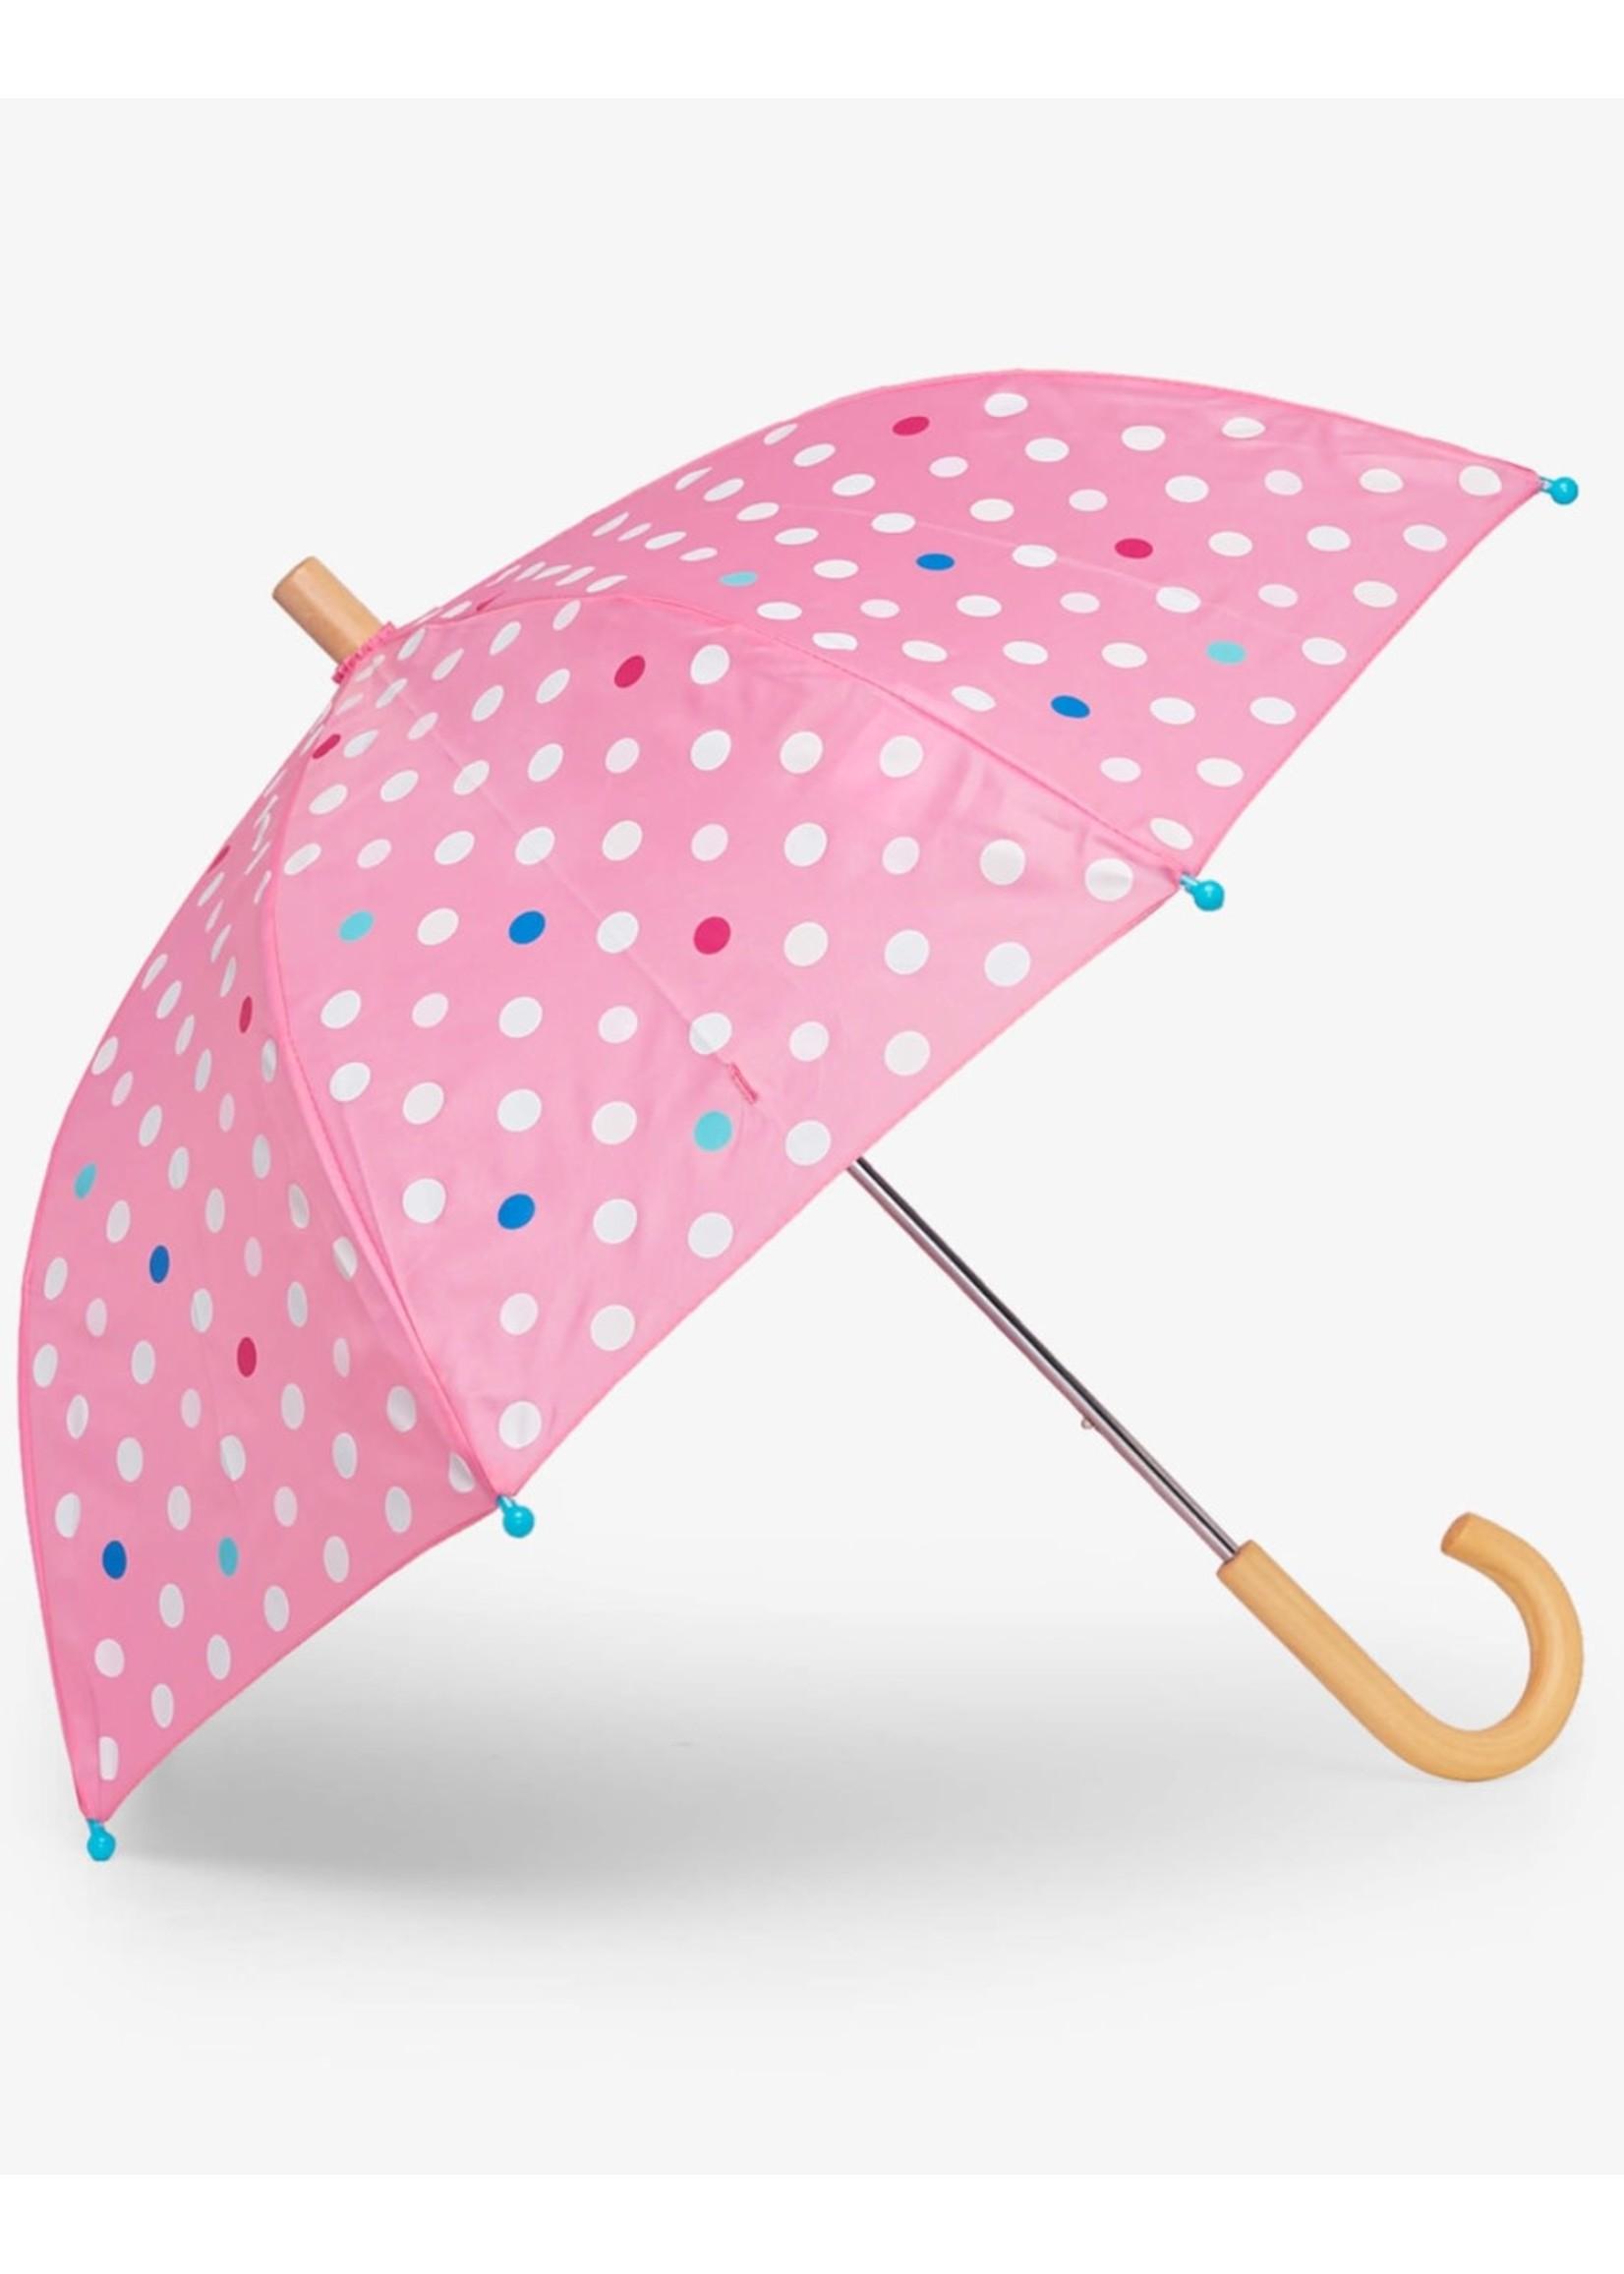 Hatley Hatley, Polka Dots Colour Change Umbrella in Pink Carnation